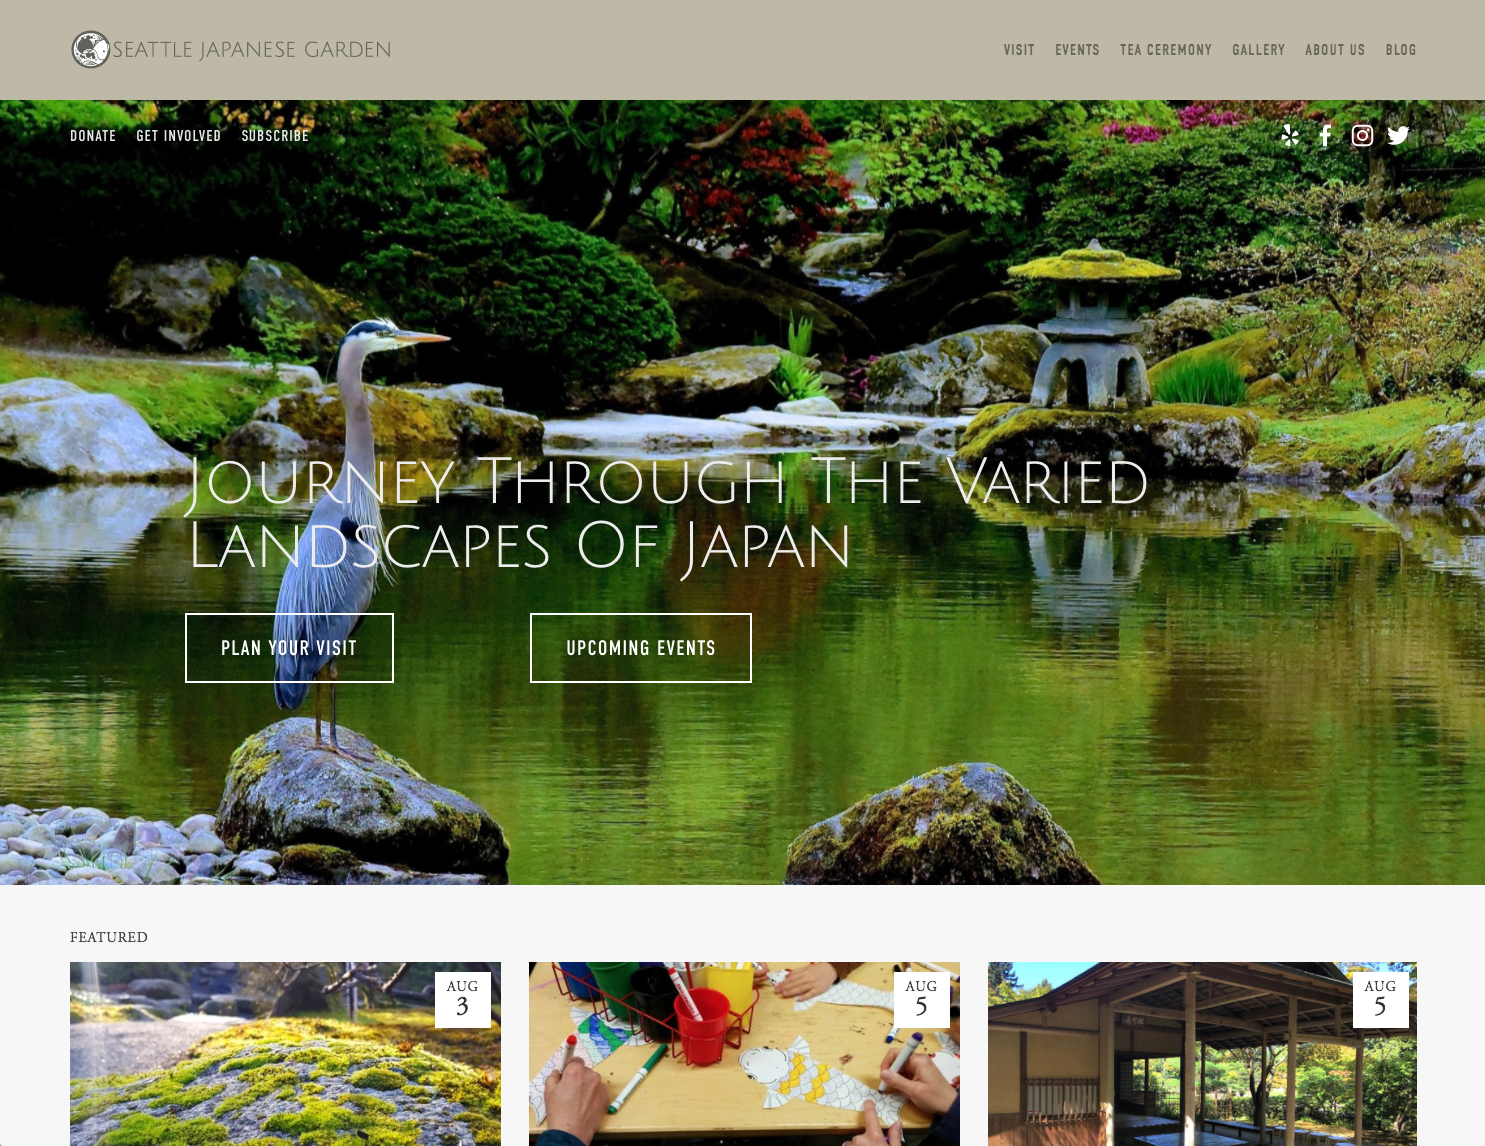 Seattle Japanese Garden - www.seattlejapanesegarden.orgPROJECTWeb Design | Identity Design Refresh